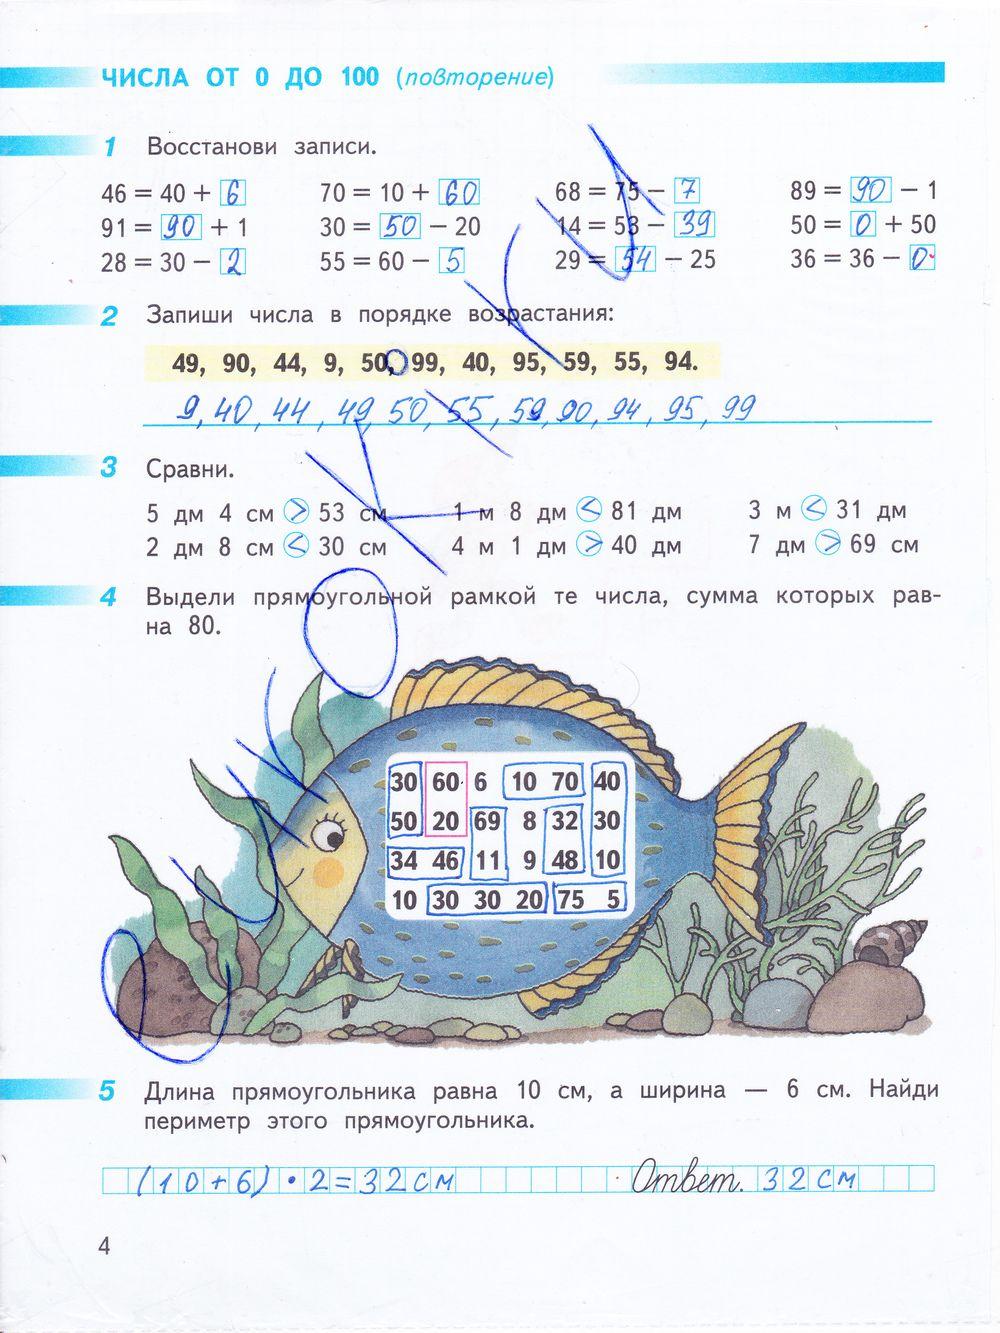 C: users 111 desktop решебник гдз по учебнику алгебра и начала анализа 10-11 класс колмогоров а.н абрамов а.м дудницын ю.п